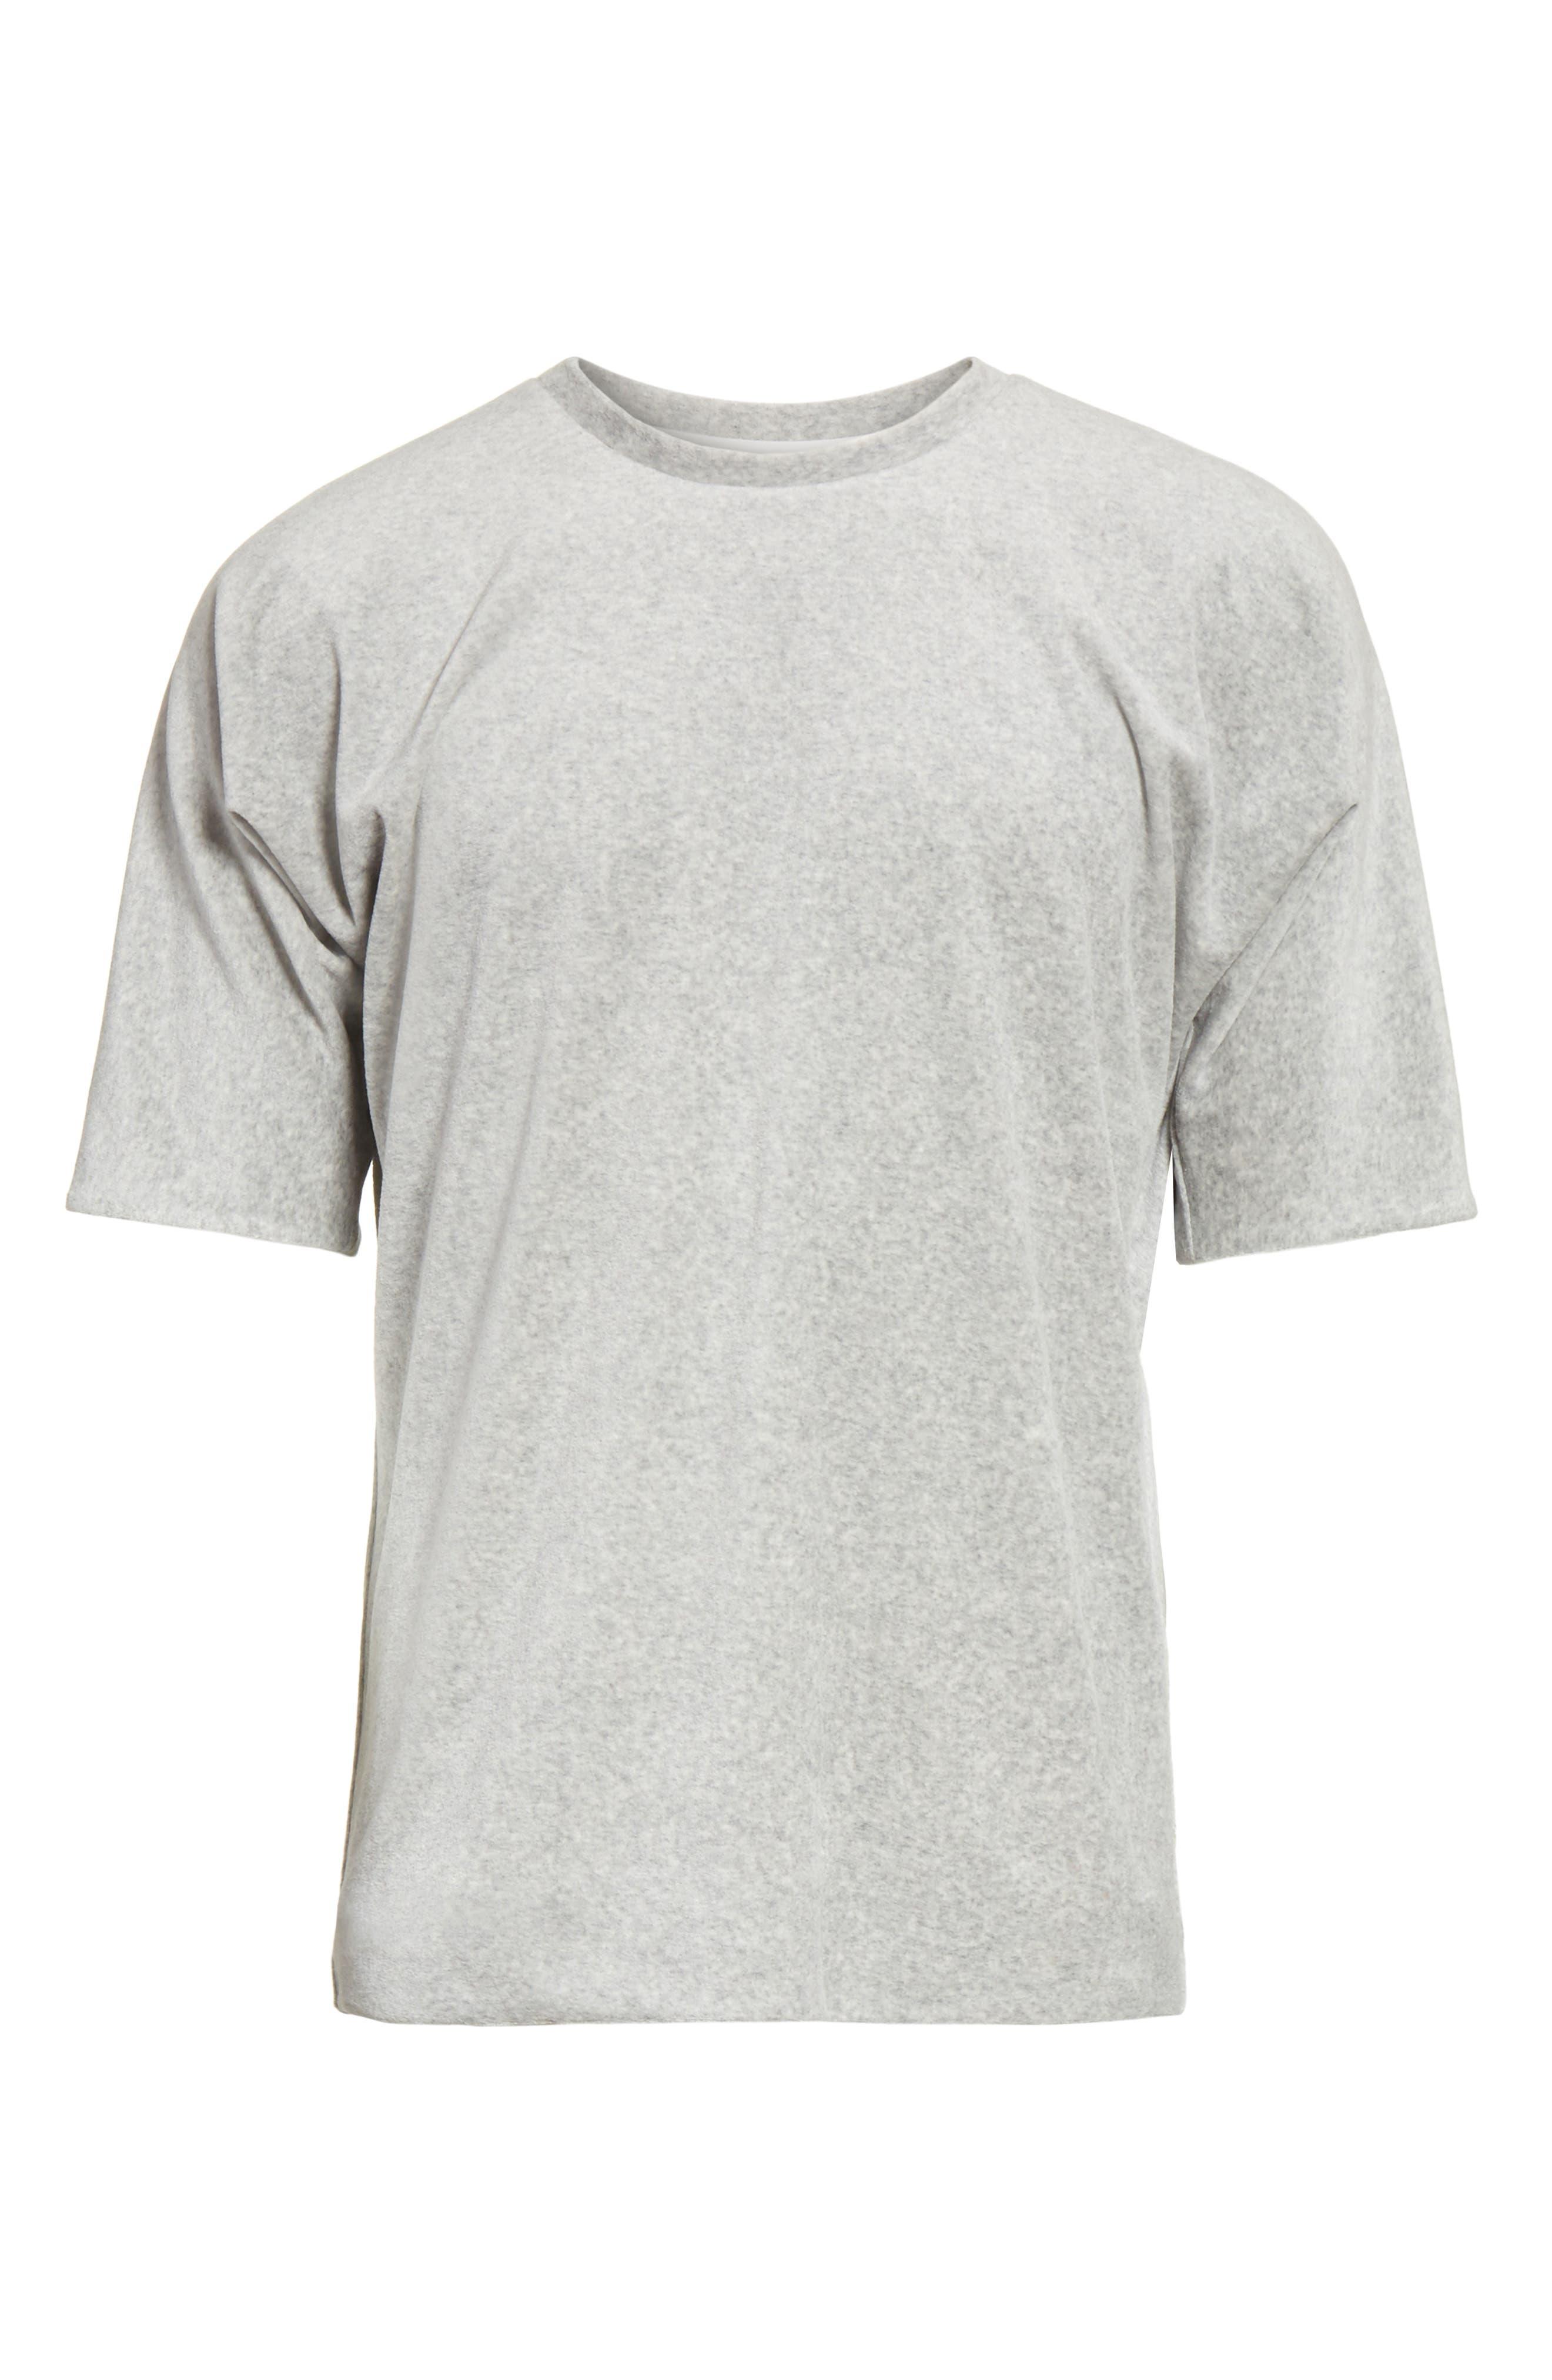 Reversible Double Layer T-Shirt,                             Alternate thumbnail 6, color,                             LIGHT GREY